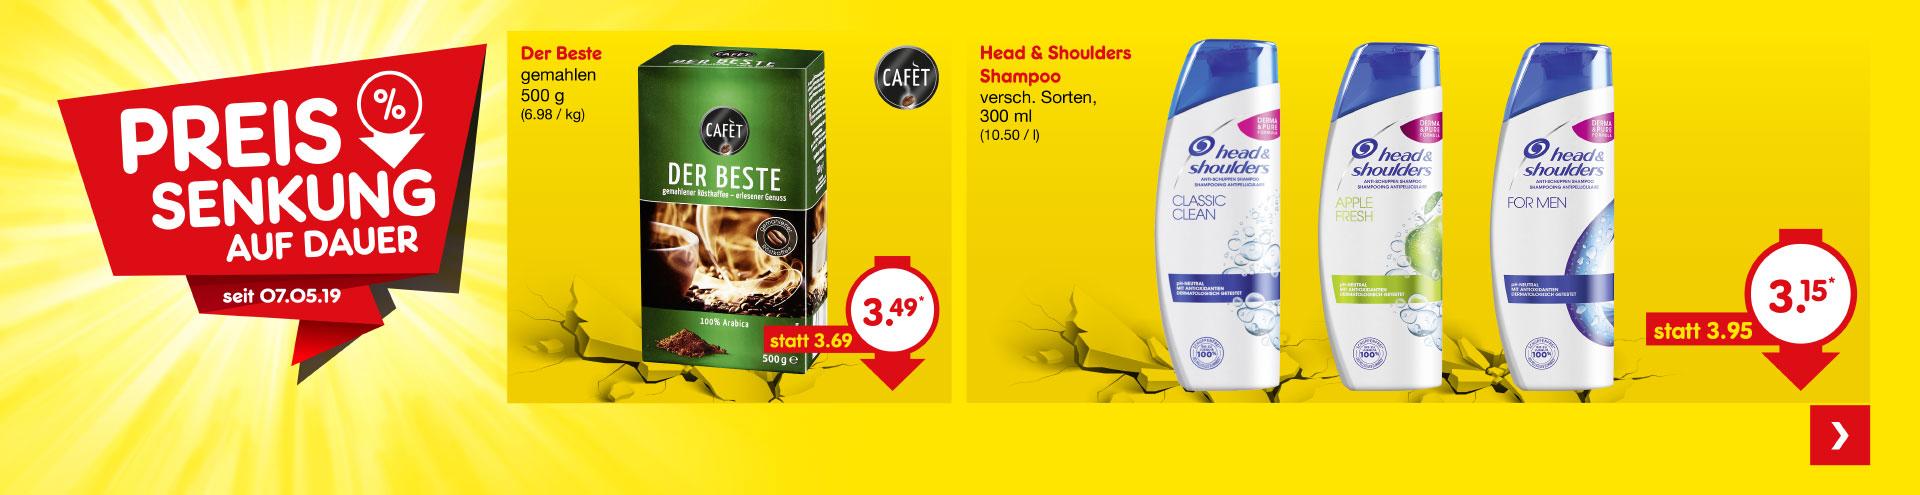 cbbca3906421fa Netto Marken-Discount